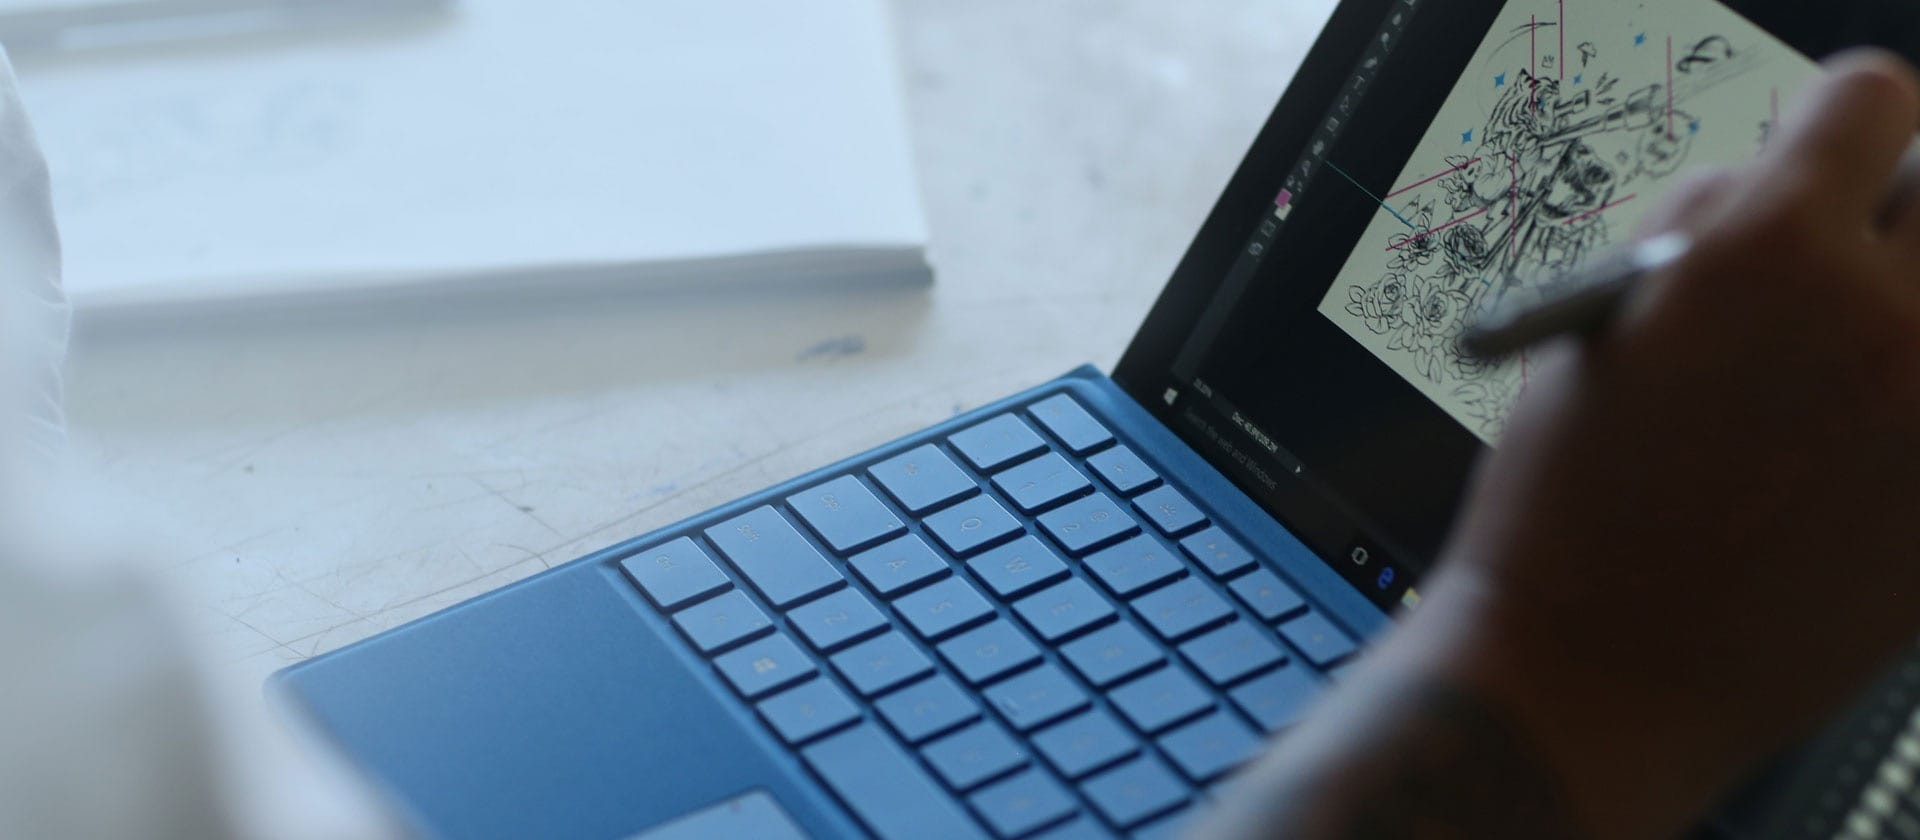 Microsoft-Surface-Pro-4-01-hero